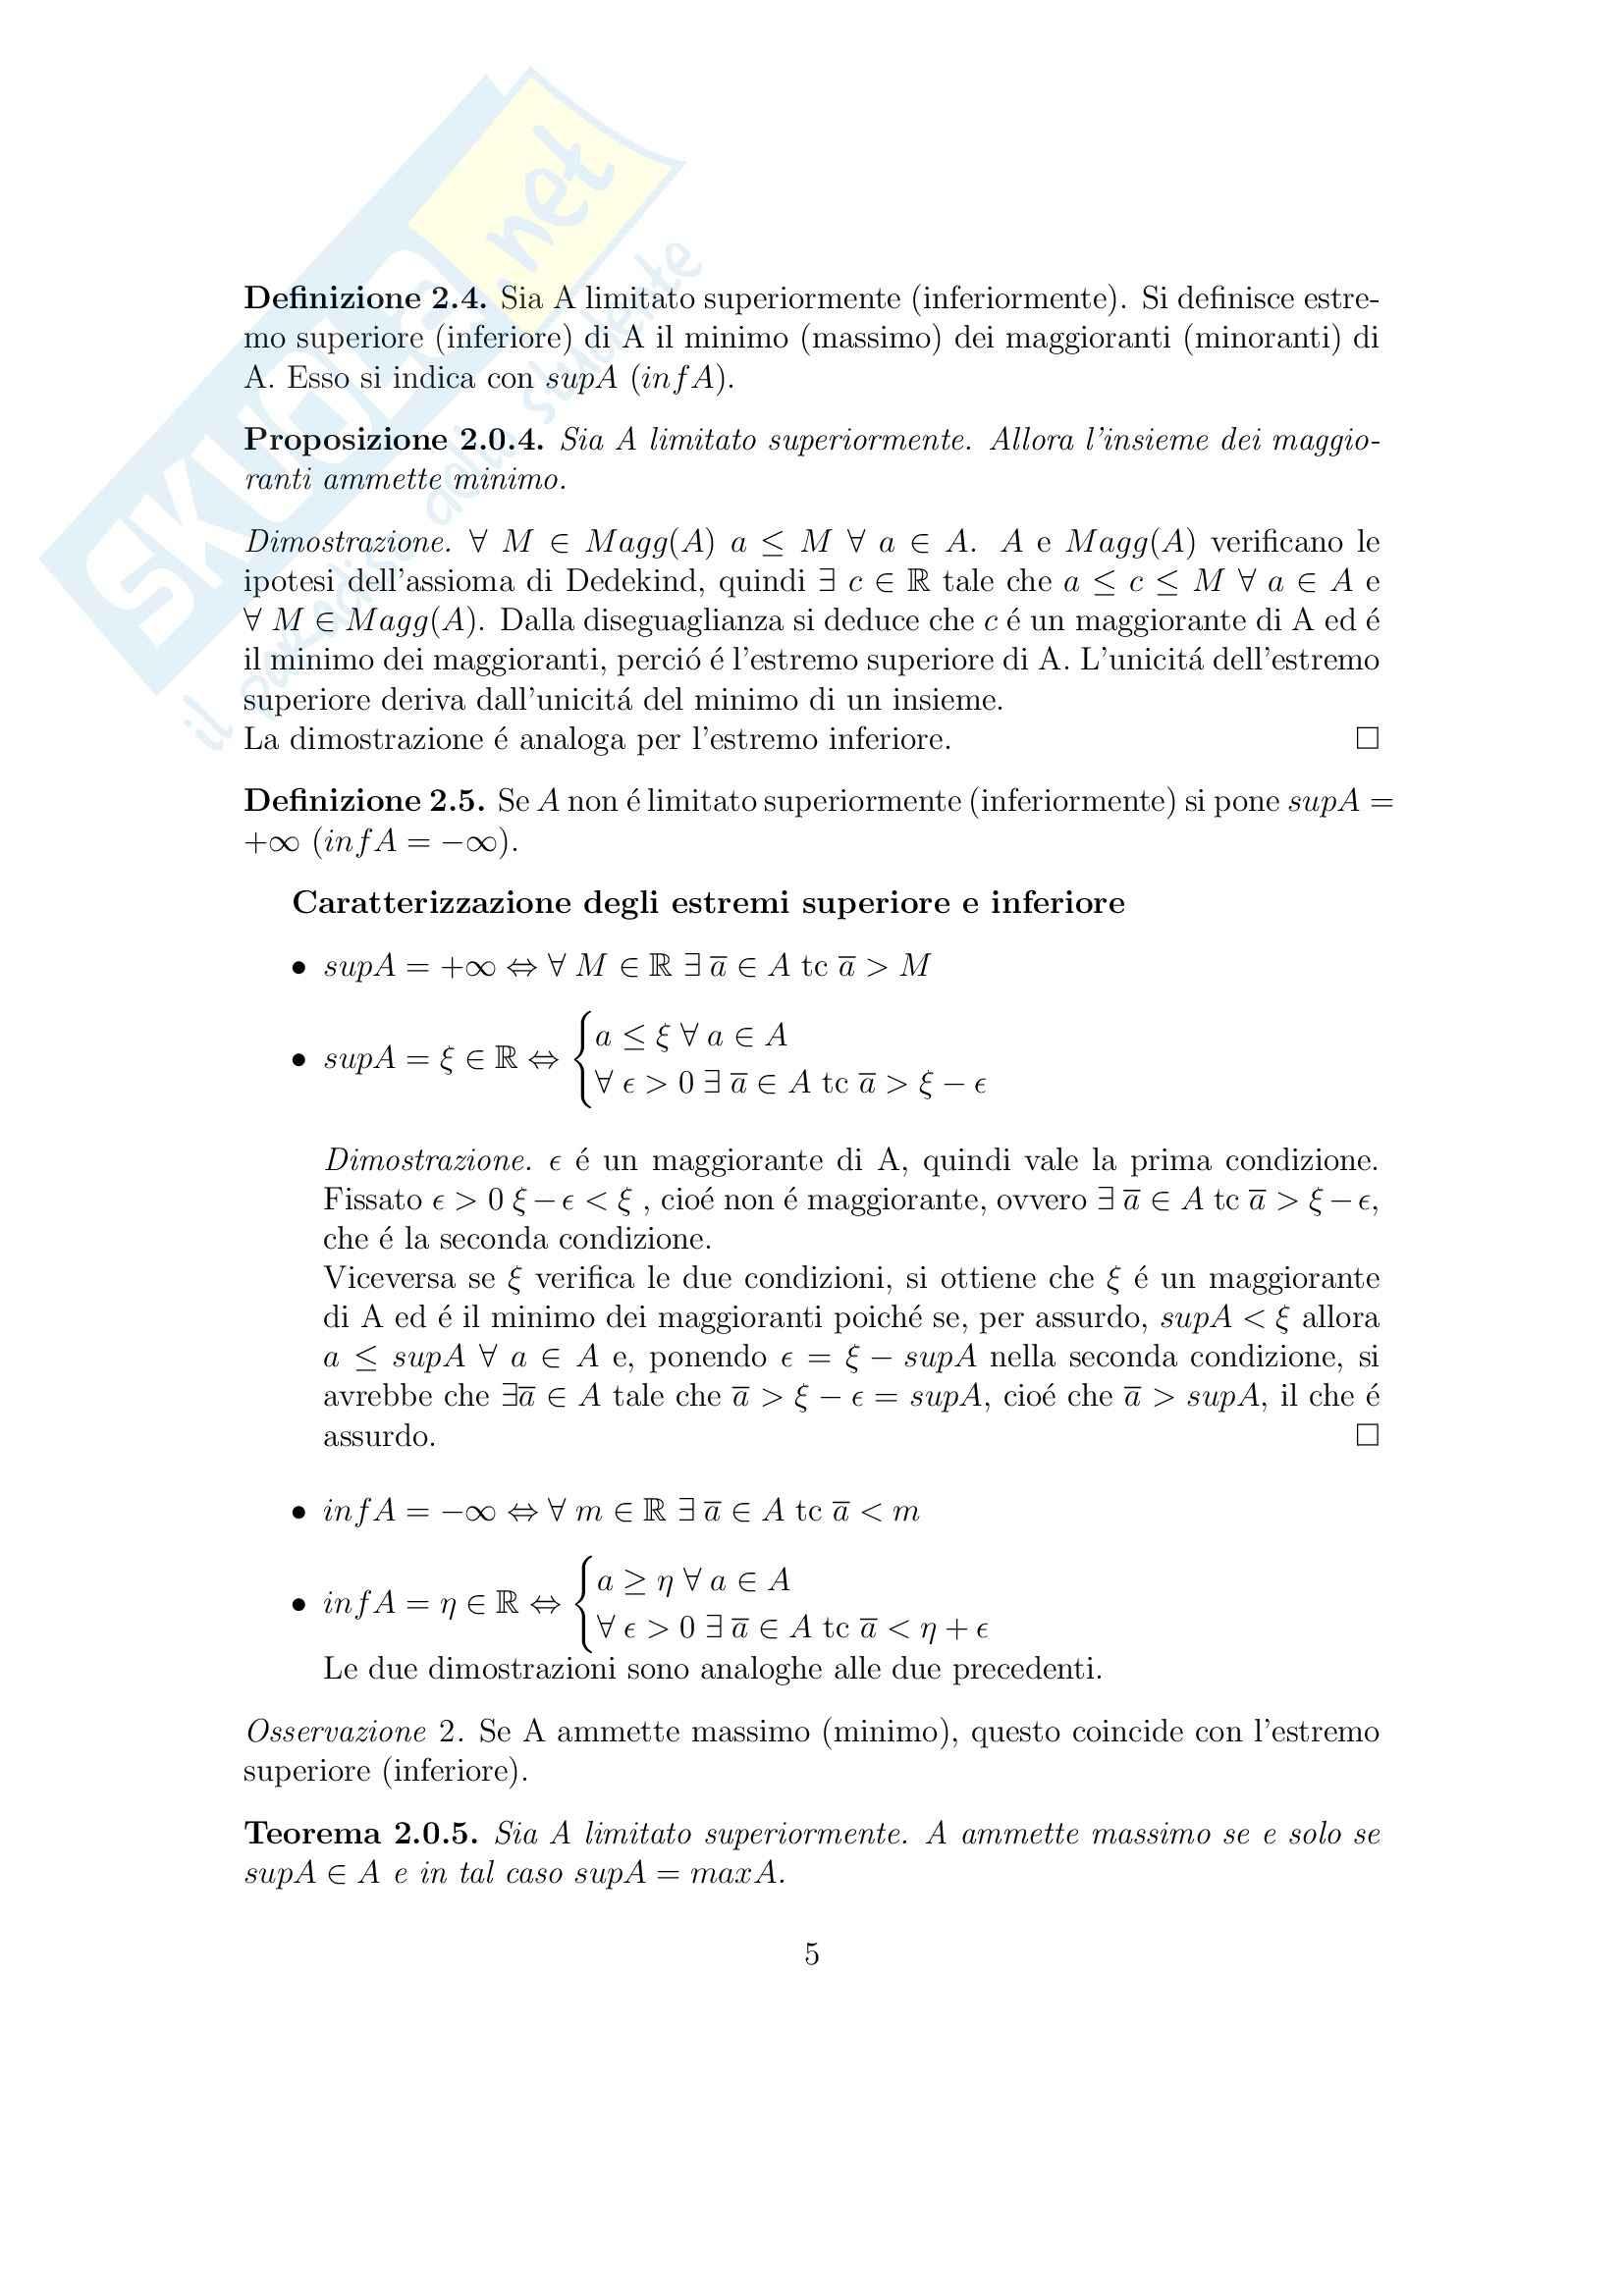 Analisi matematica 1 - Appunti Pag. 6